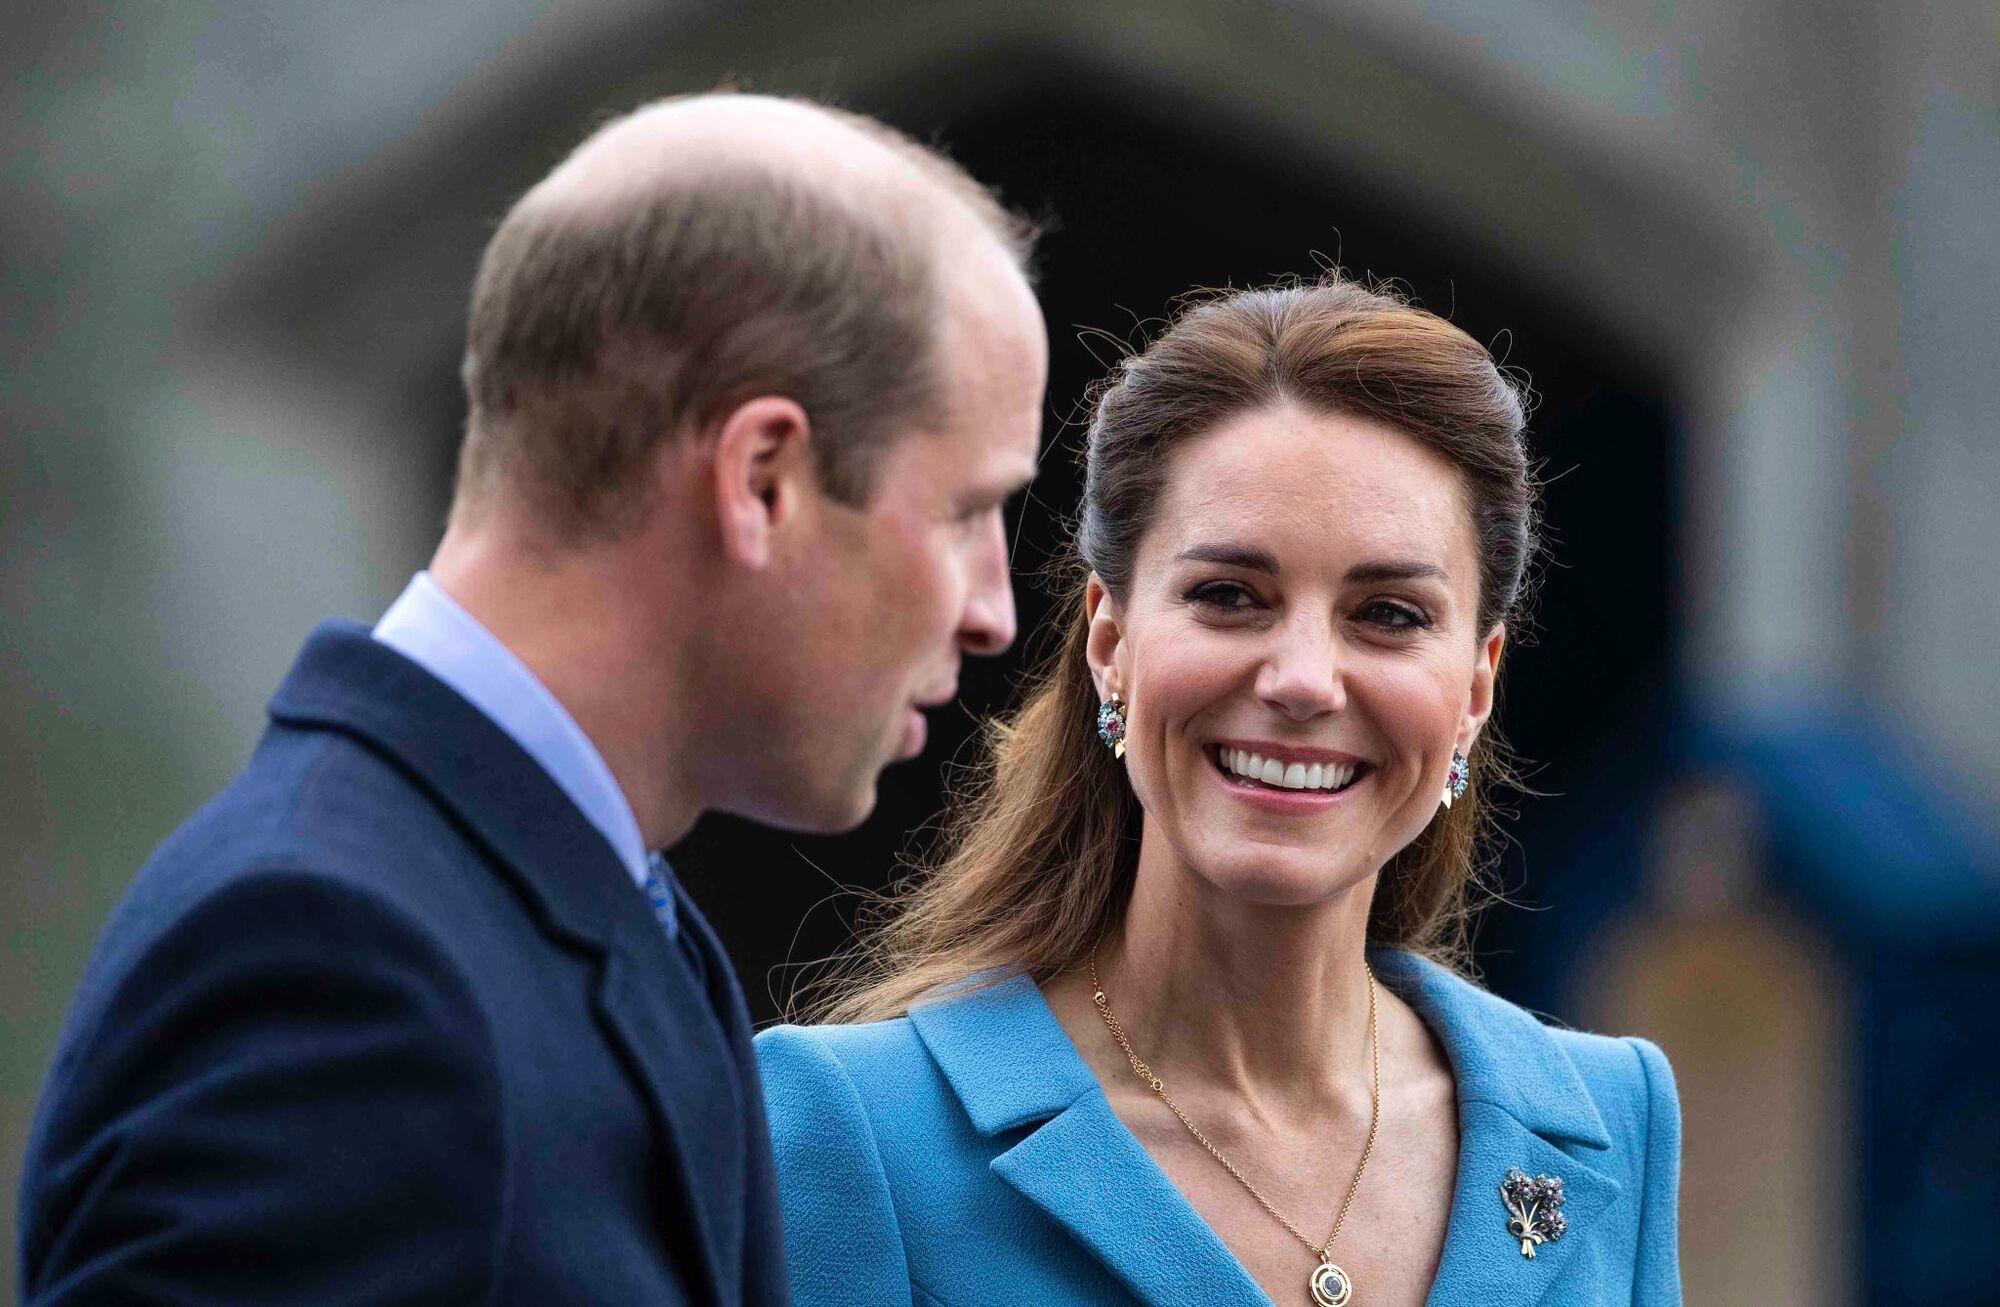 Кейт Миддлтон и принц Уильям на мероприятии.